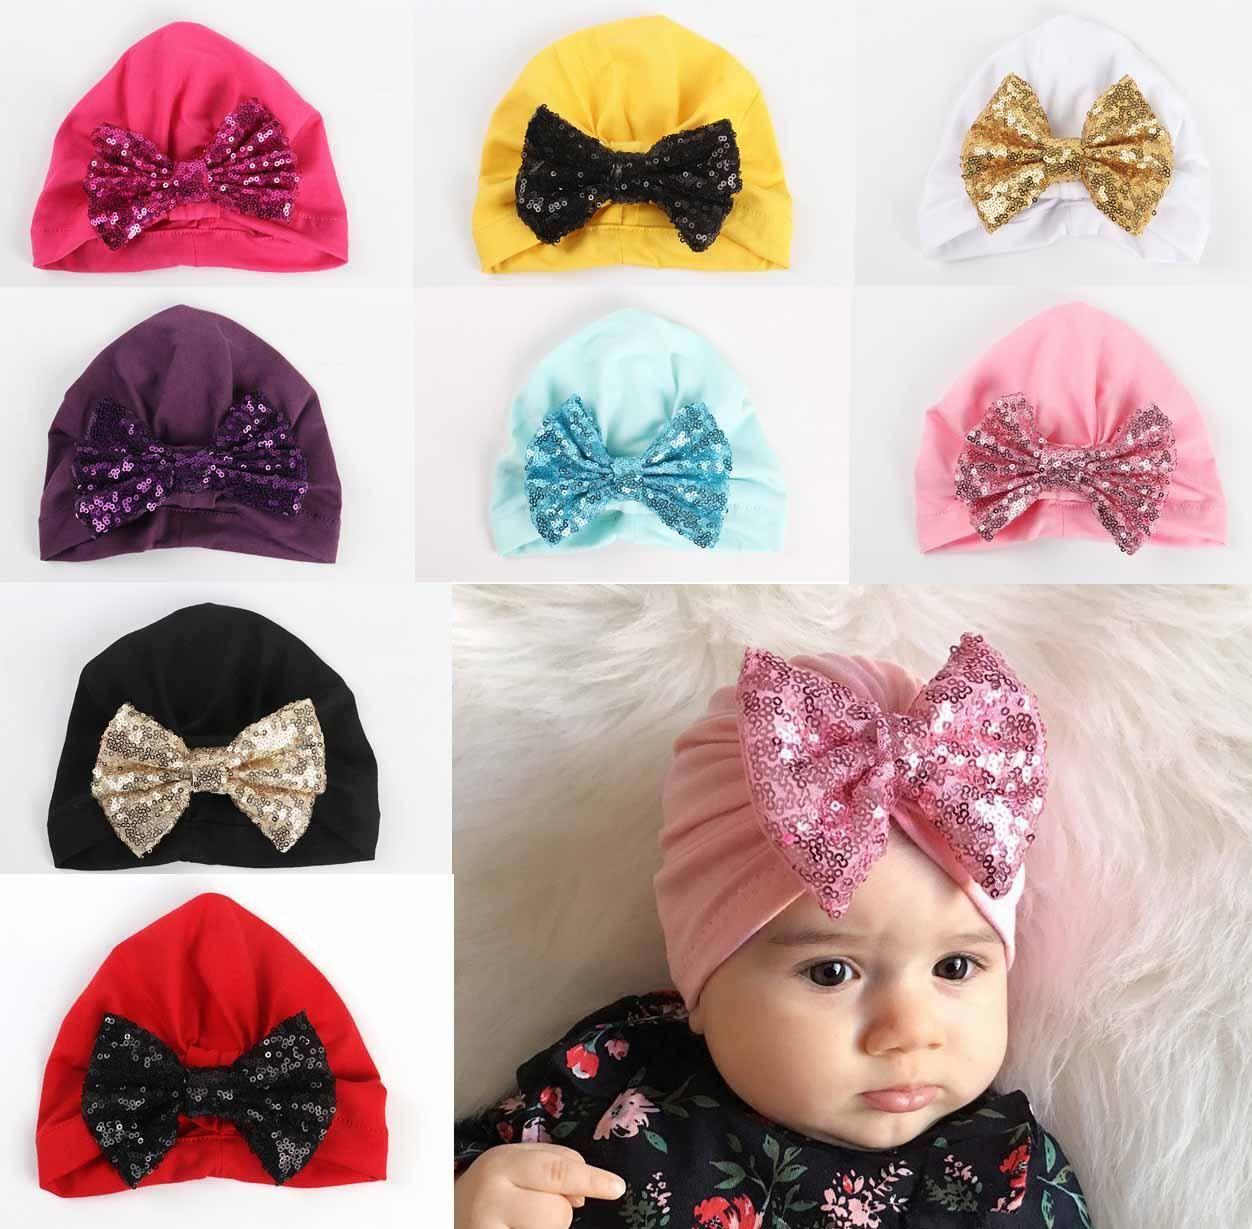 impuesto Testificar Escalera  turbante infantil - Pesquisa Google   Turbantes infantil, Croche infantil,  Turbante de bebê